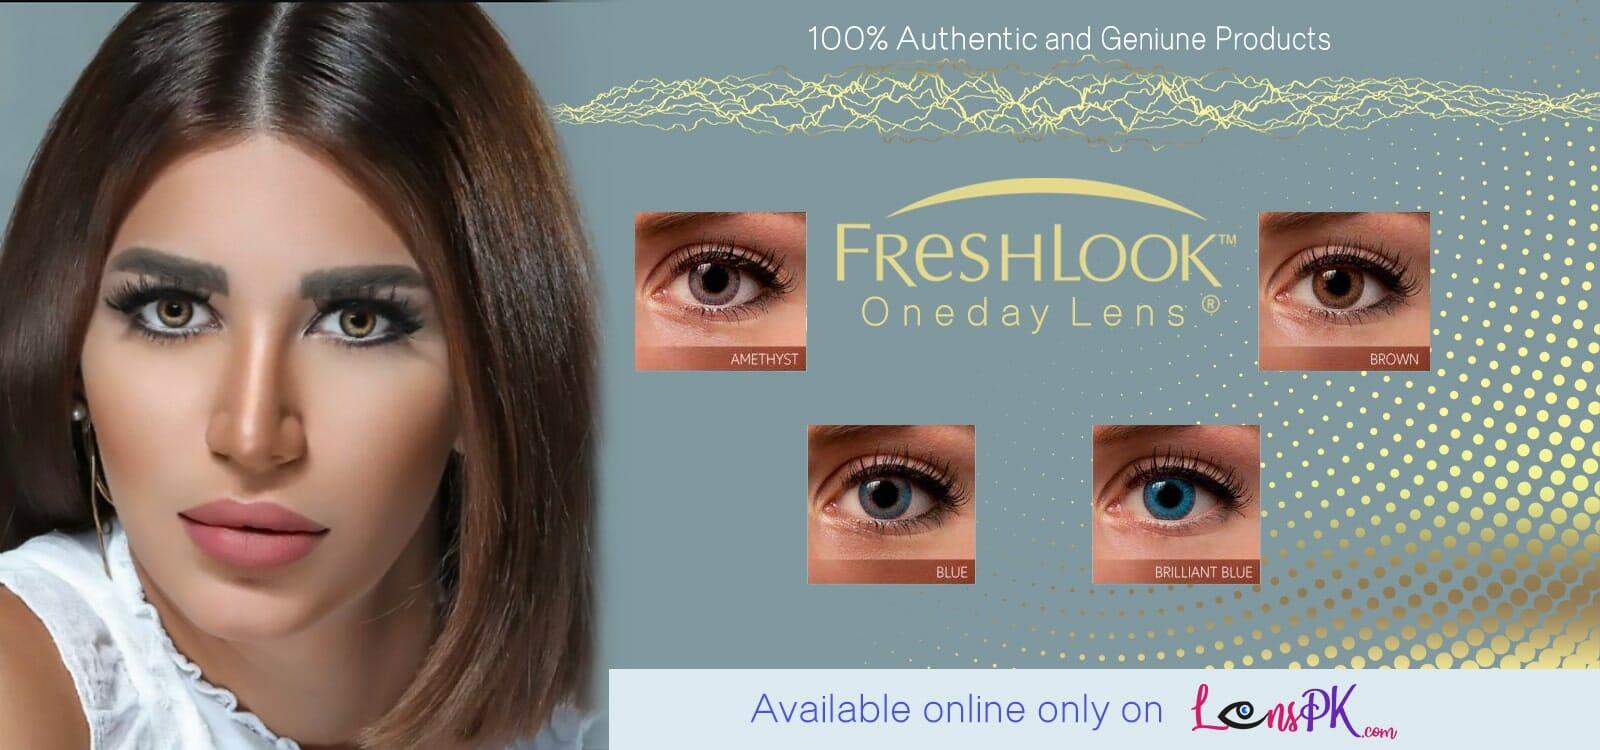 Buy Freshlook One Day Contact Lenses Online - lenspk.com